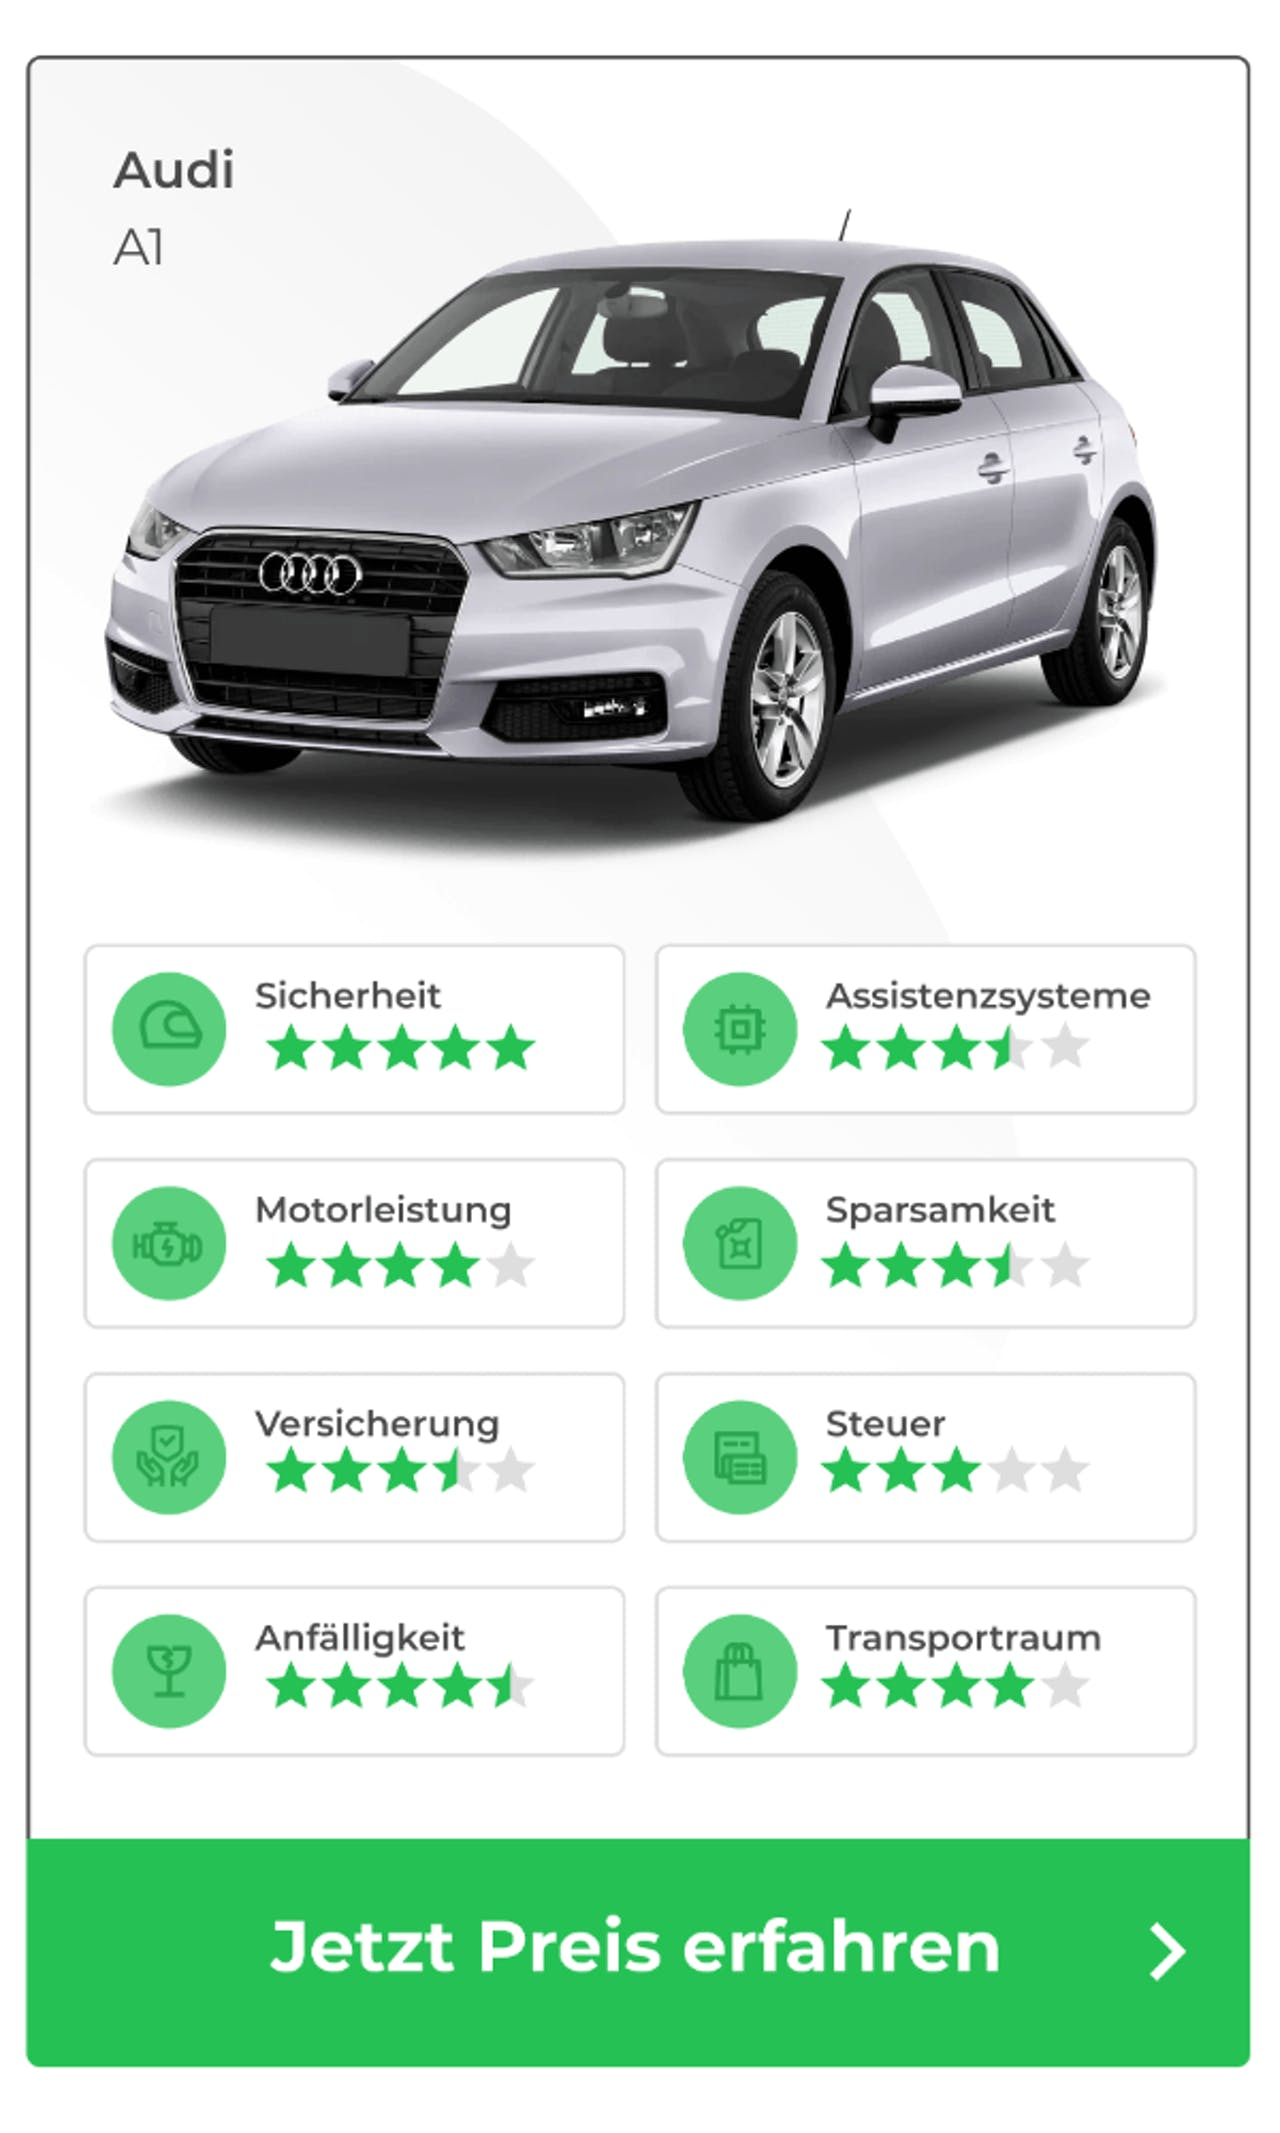 Audi A1 als perfektes erstes Auto? Platz zwei im VEHICULUM Check